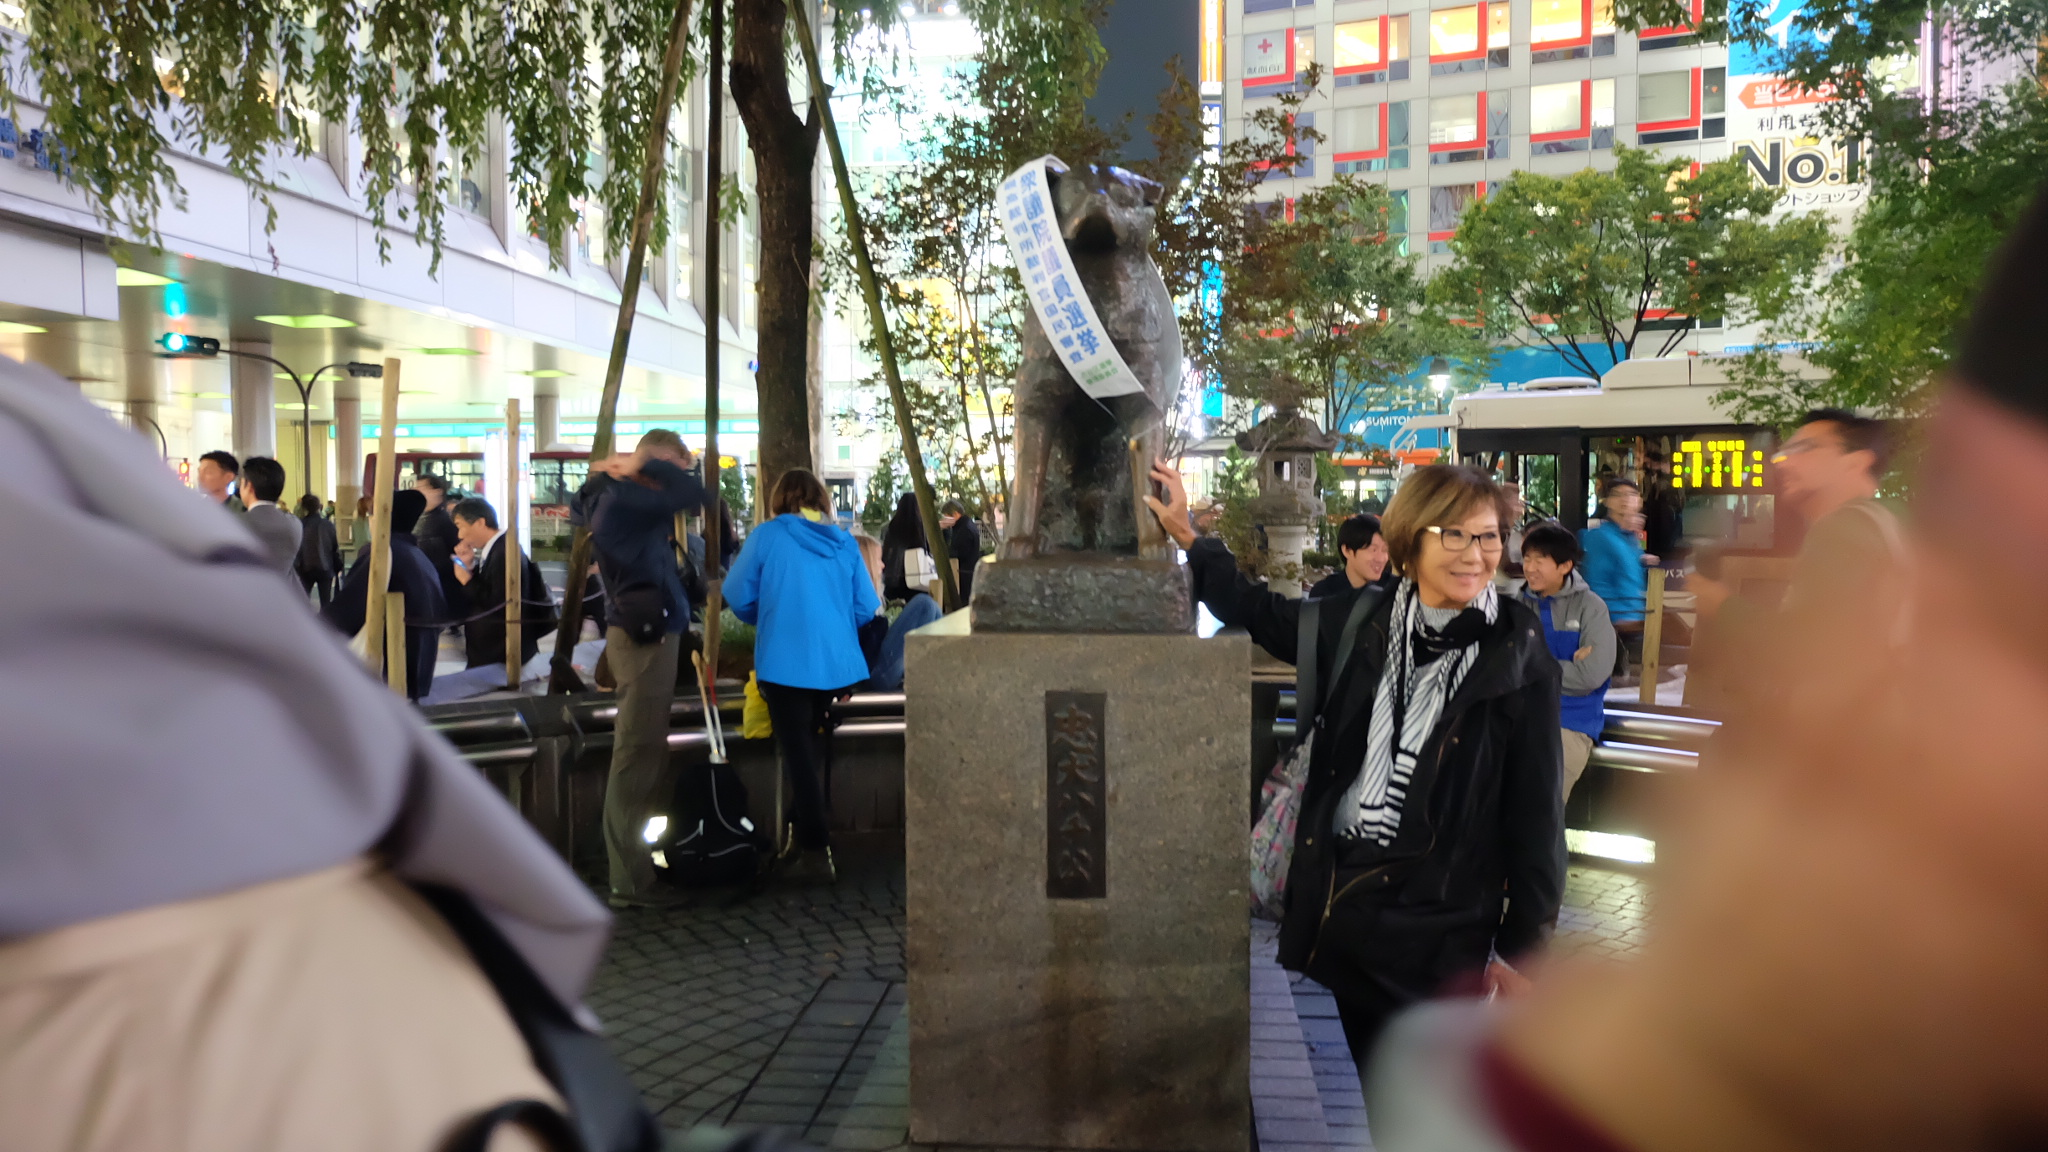 6 Days in Japan (Tokyo - Osaka - Kyoto) Part 1